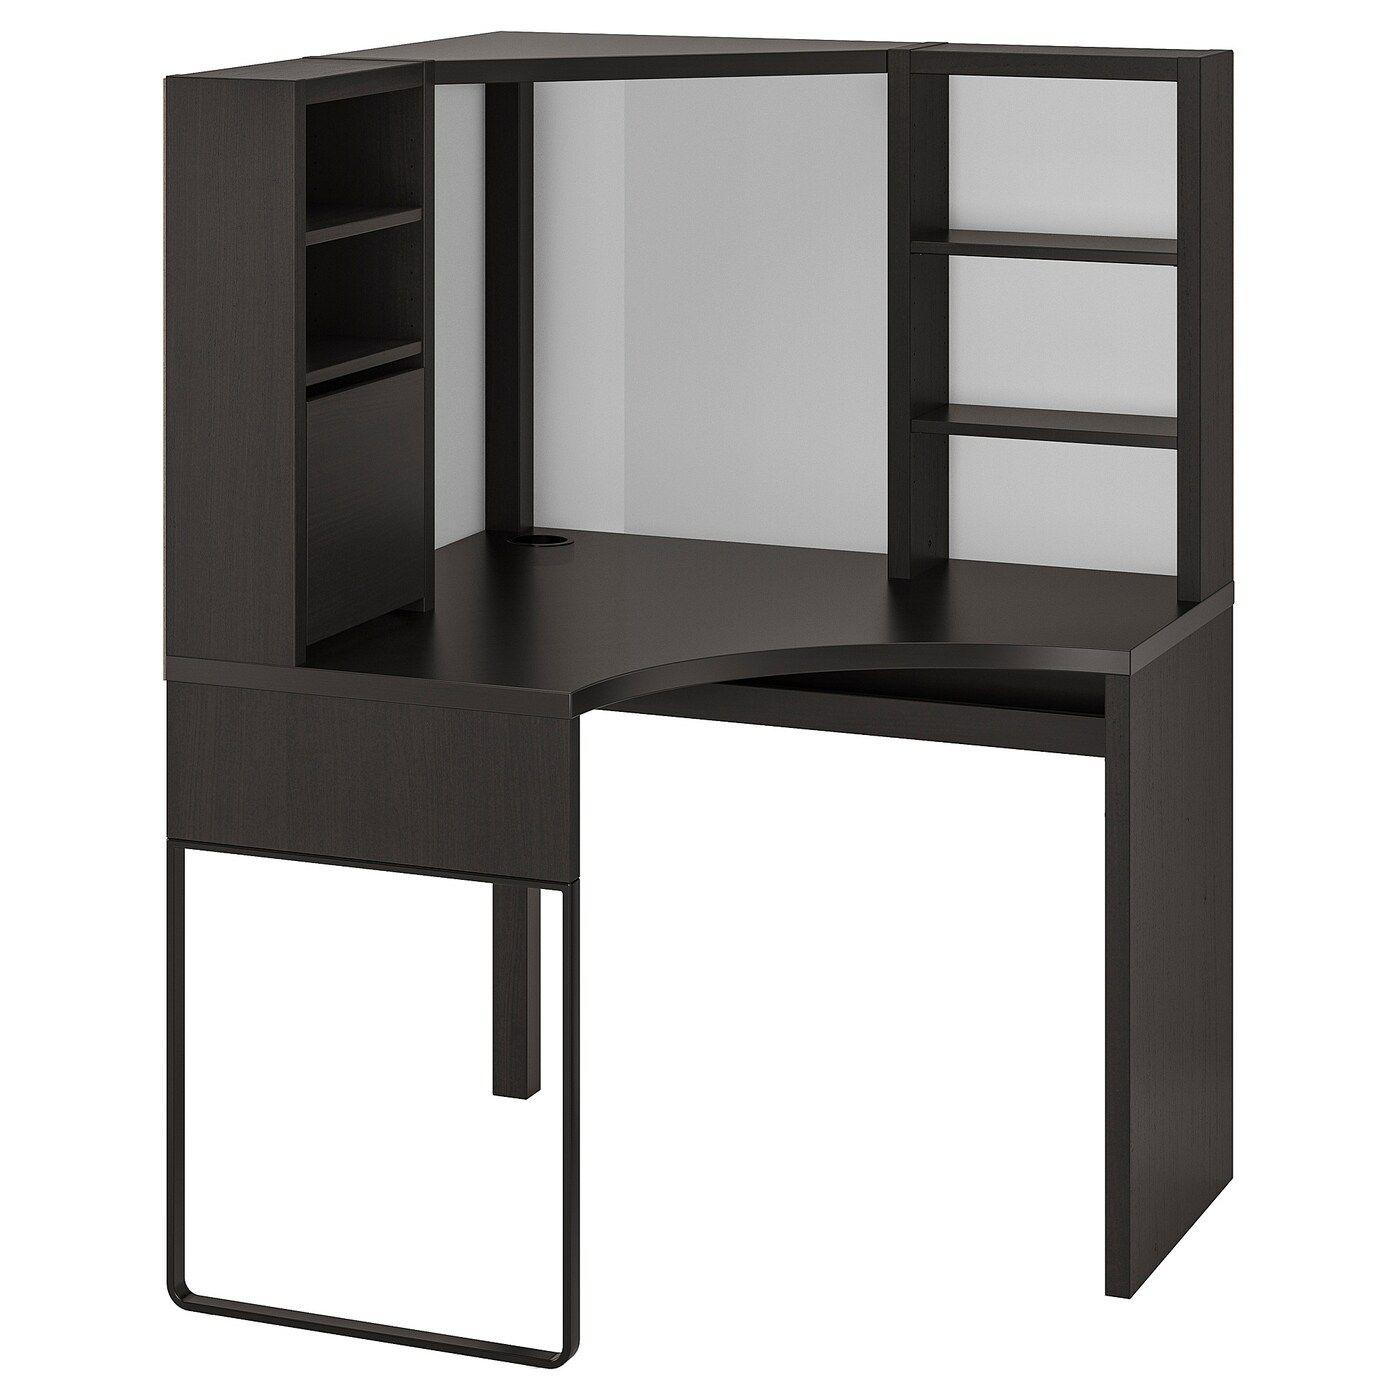 Micke Corner Workstation Black Brown 39 3 8x55 7 8 Ikea Corner Workstation Ikea Micke Loft Bed Frame